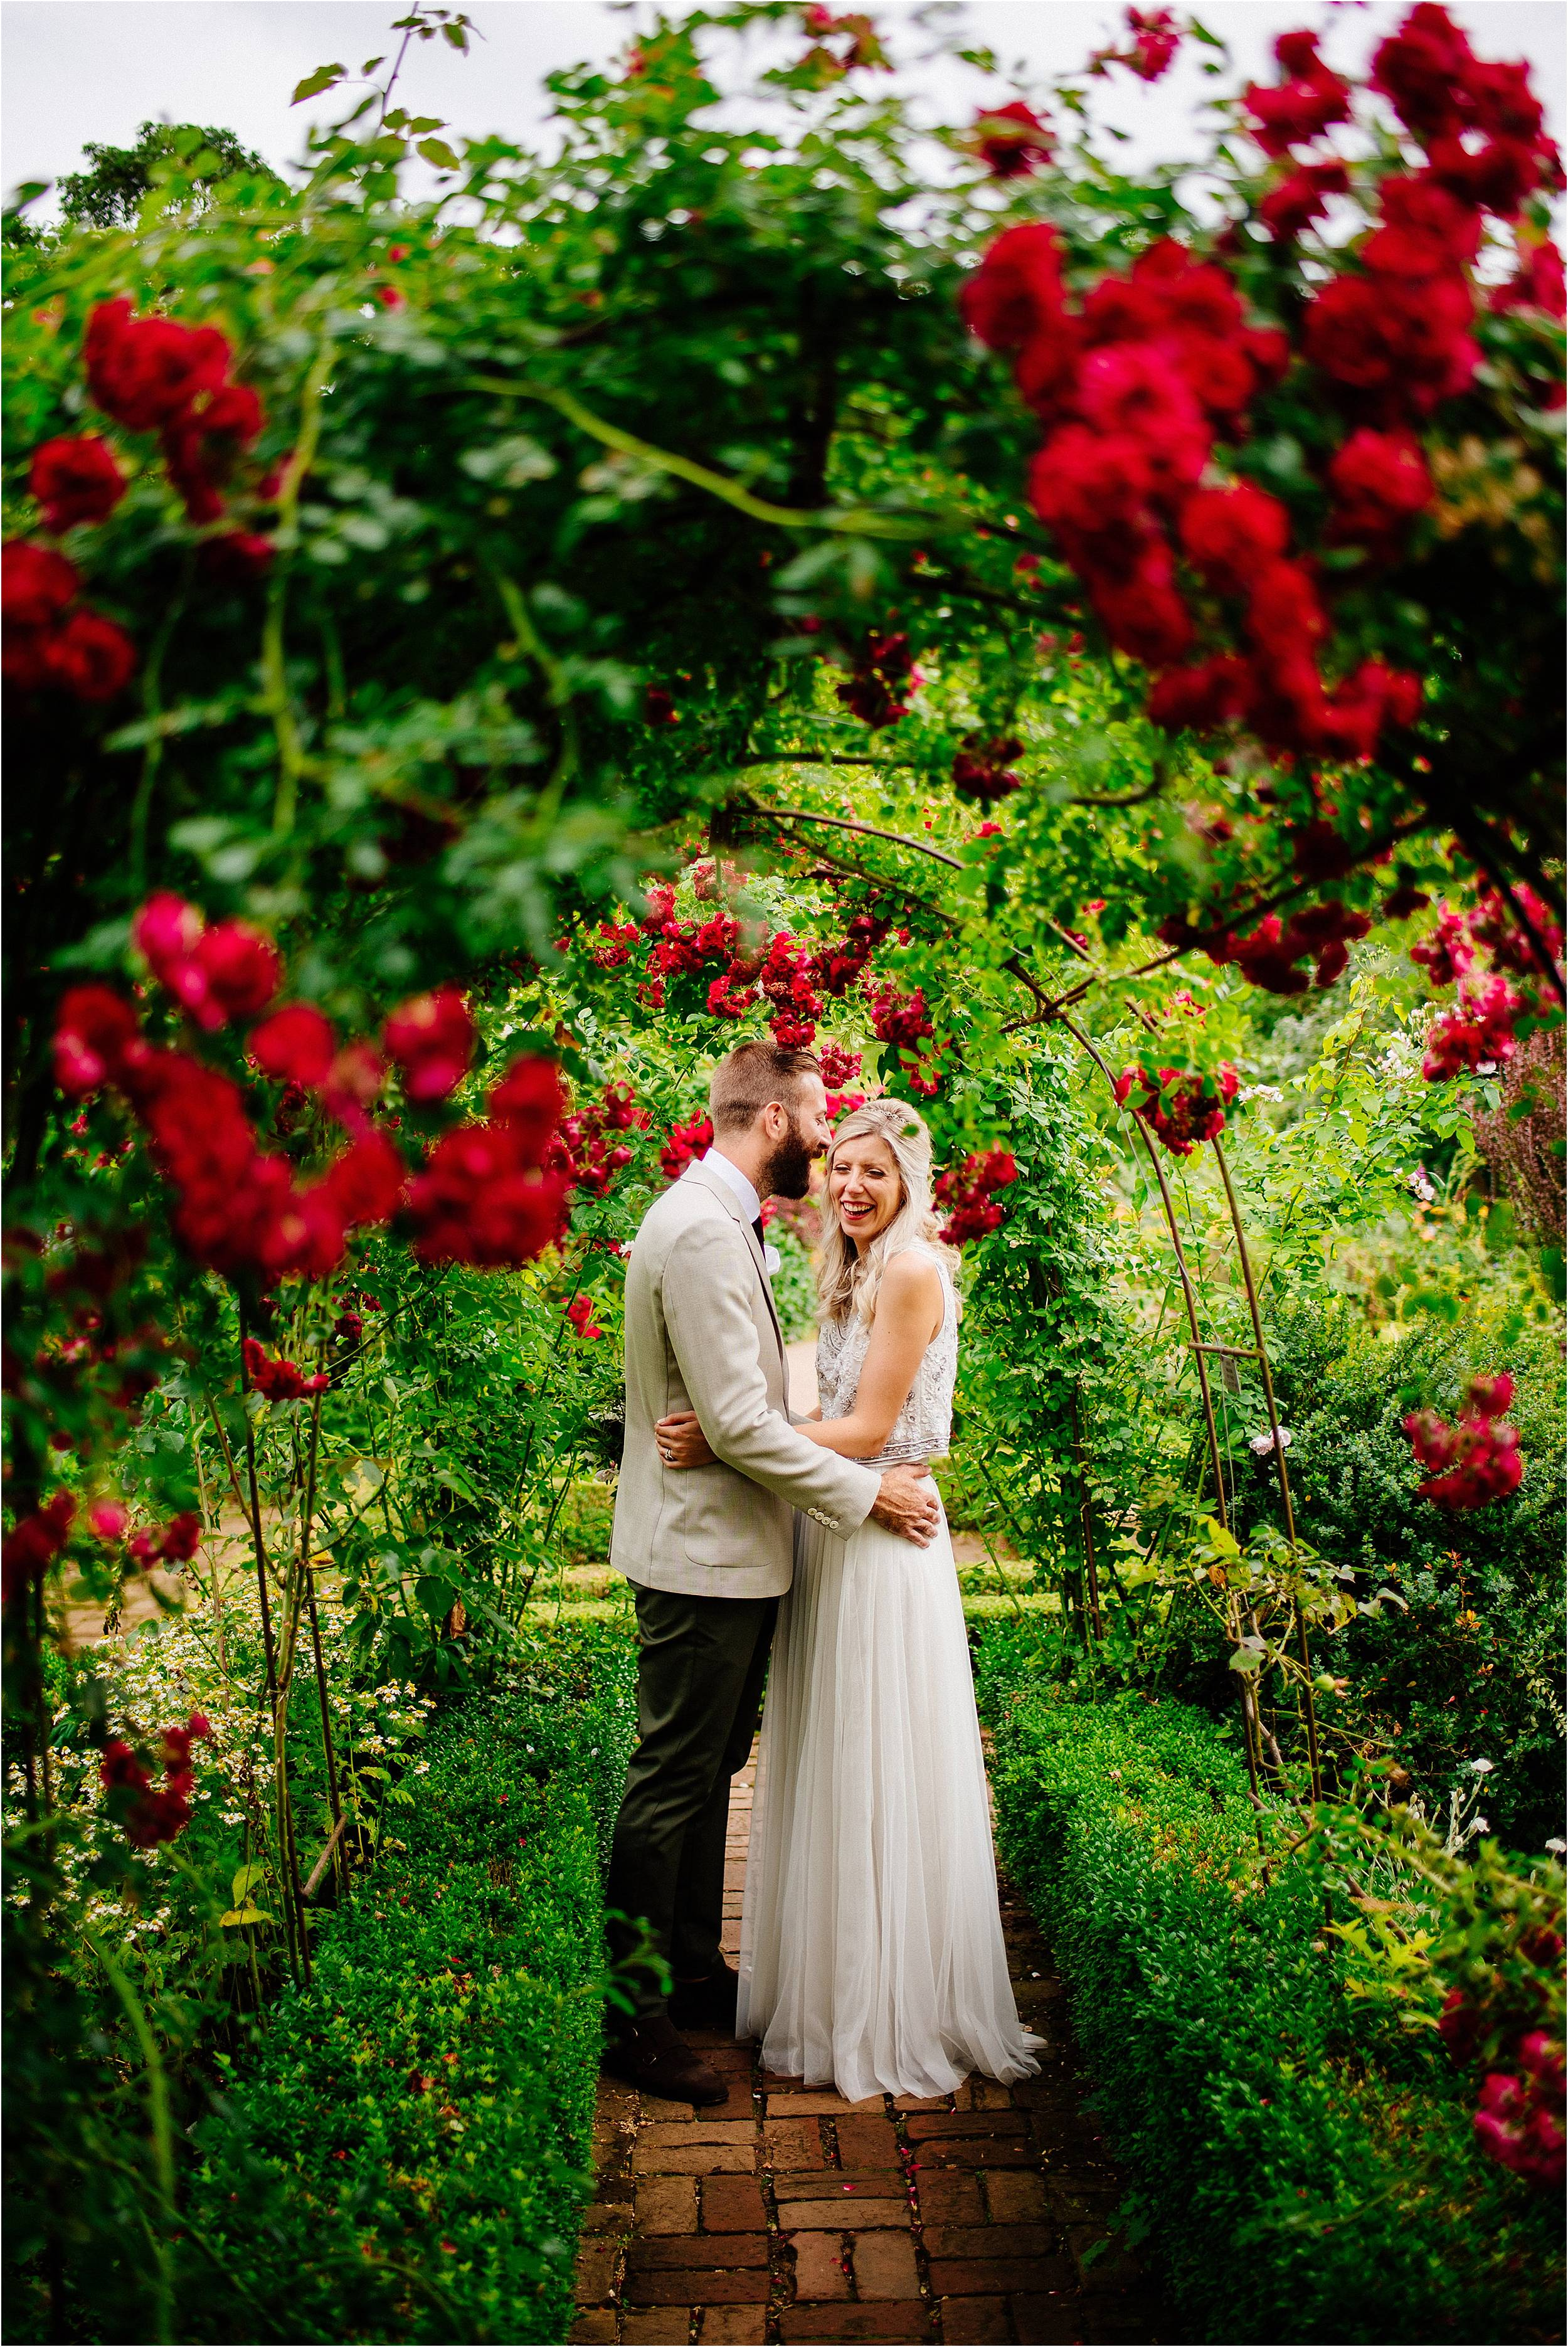 Barnsdale Gardens Wedding Photographer_0066.jpg